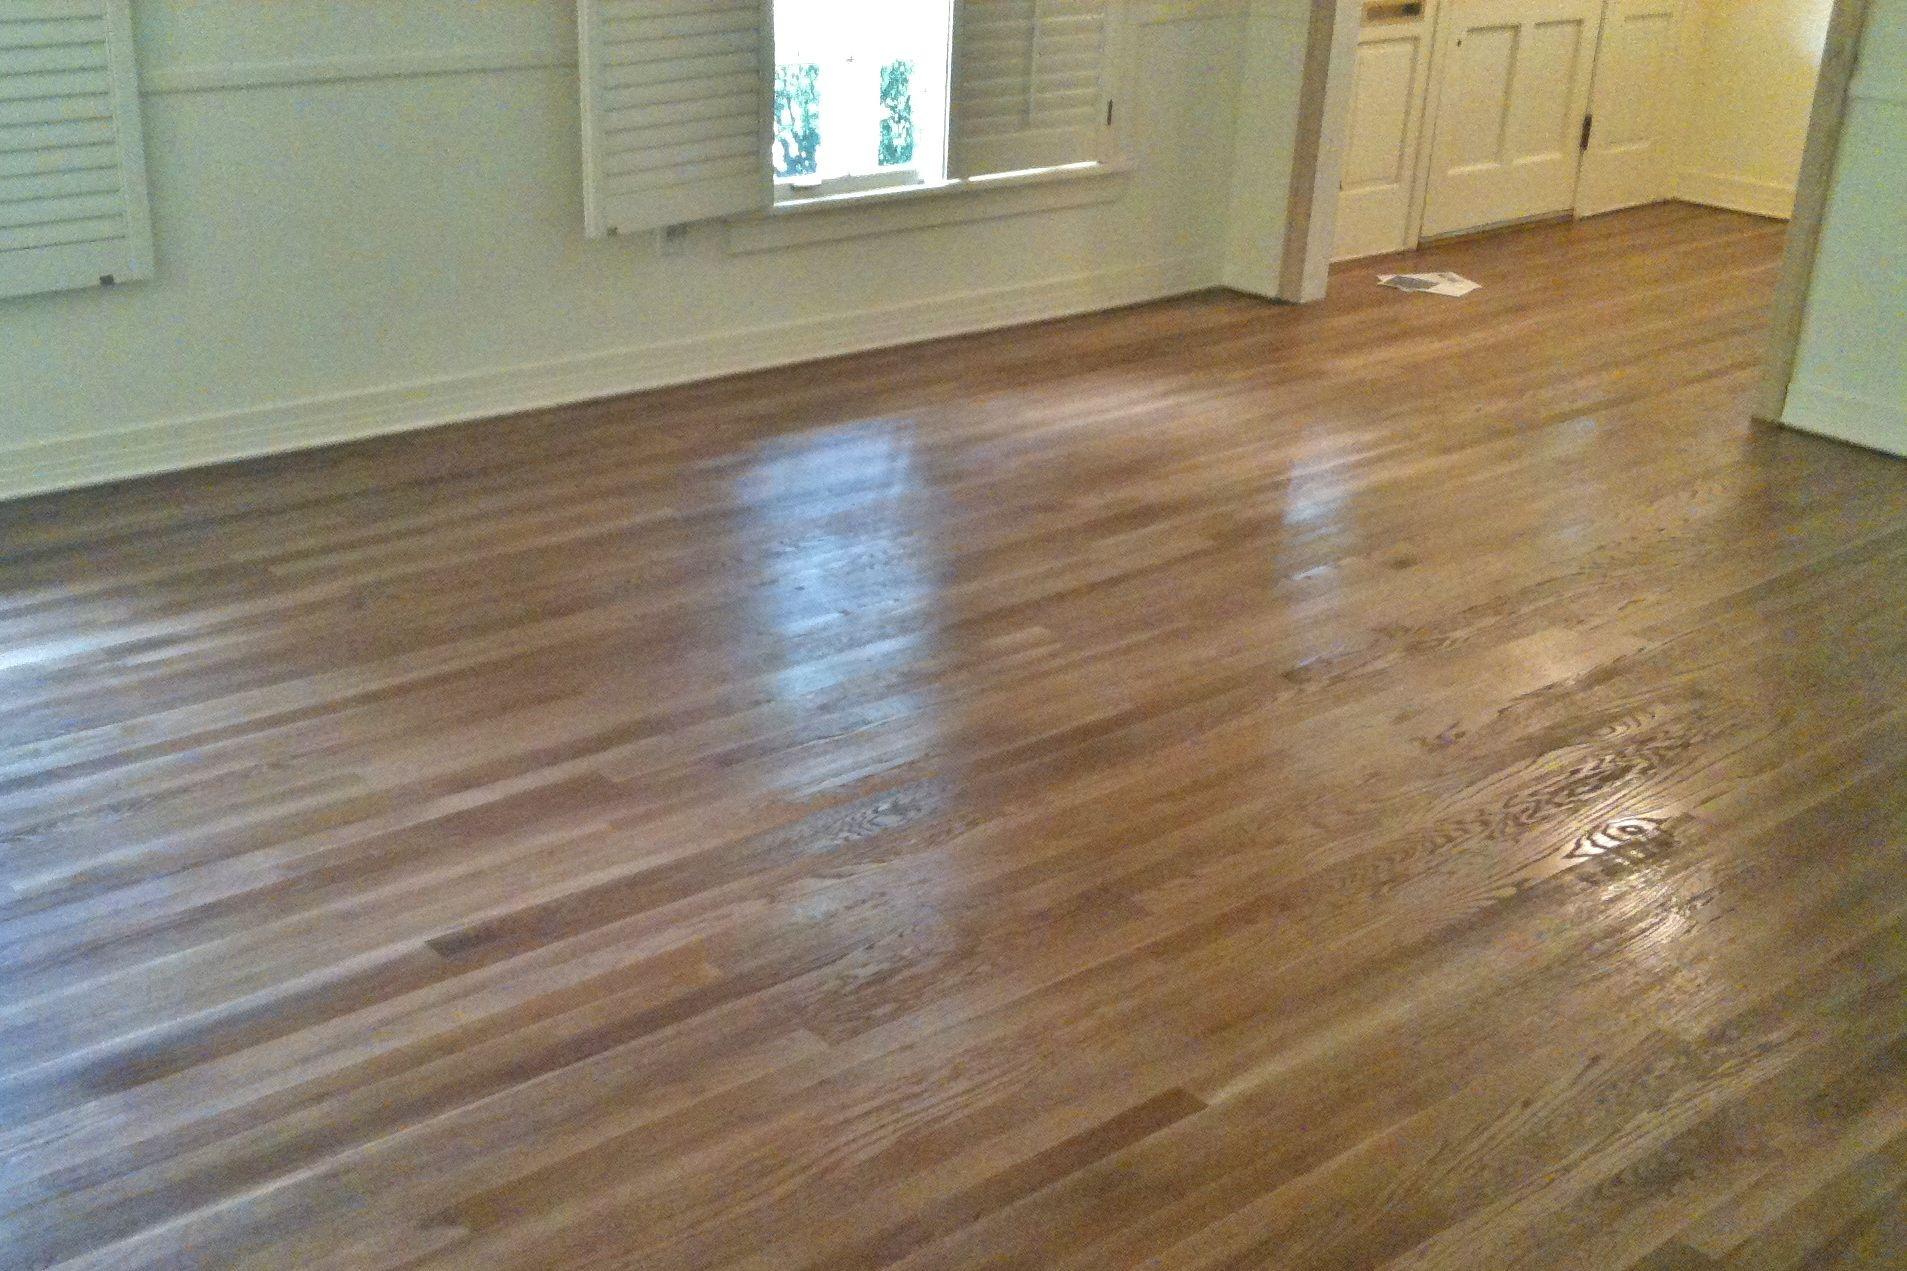 sanding hardwood floors of oak meet special walnut home design pinterest flooring throughout minwax special walnut stain on oak hardwood floors walnut hardwood flooring refinishing hardwood